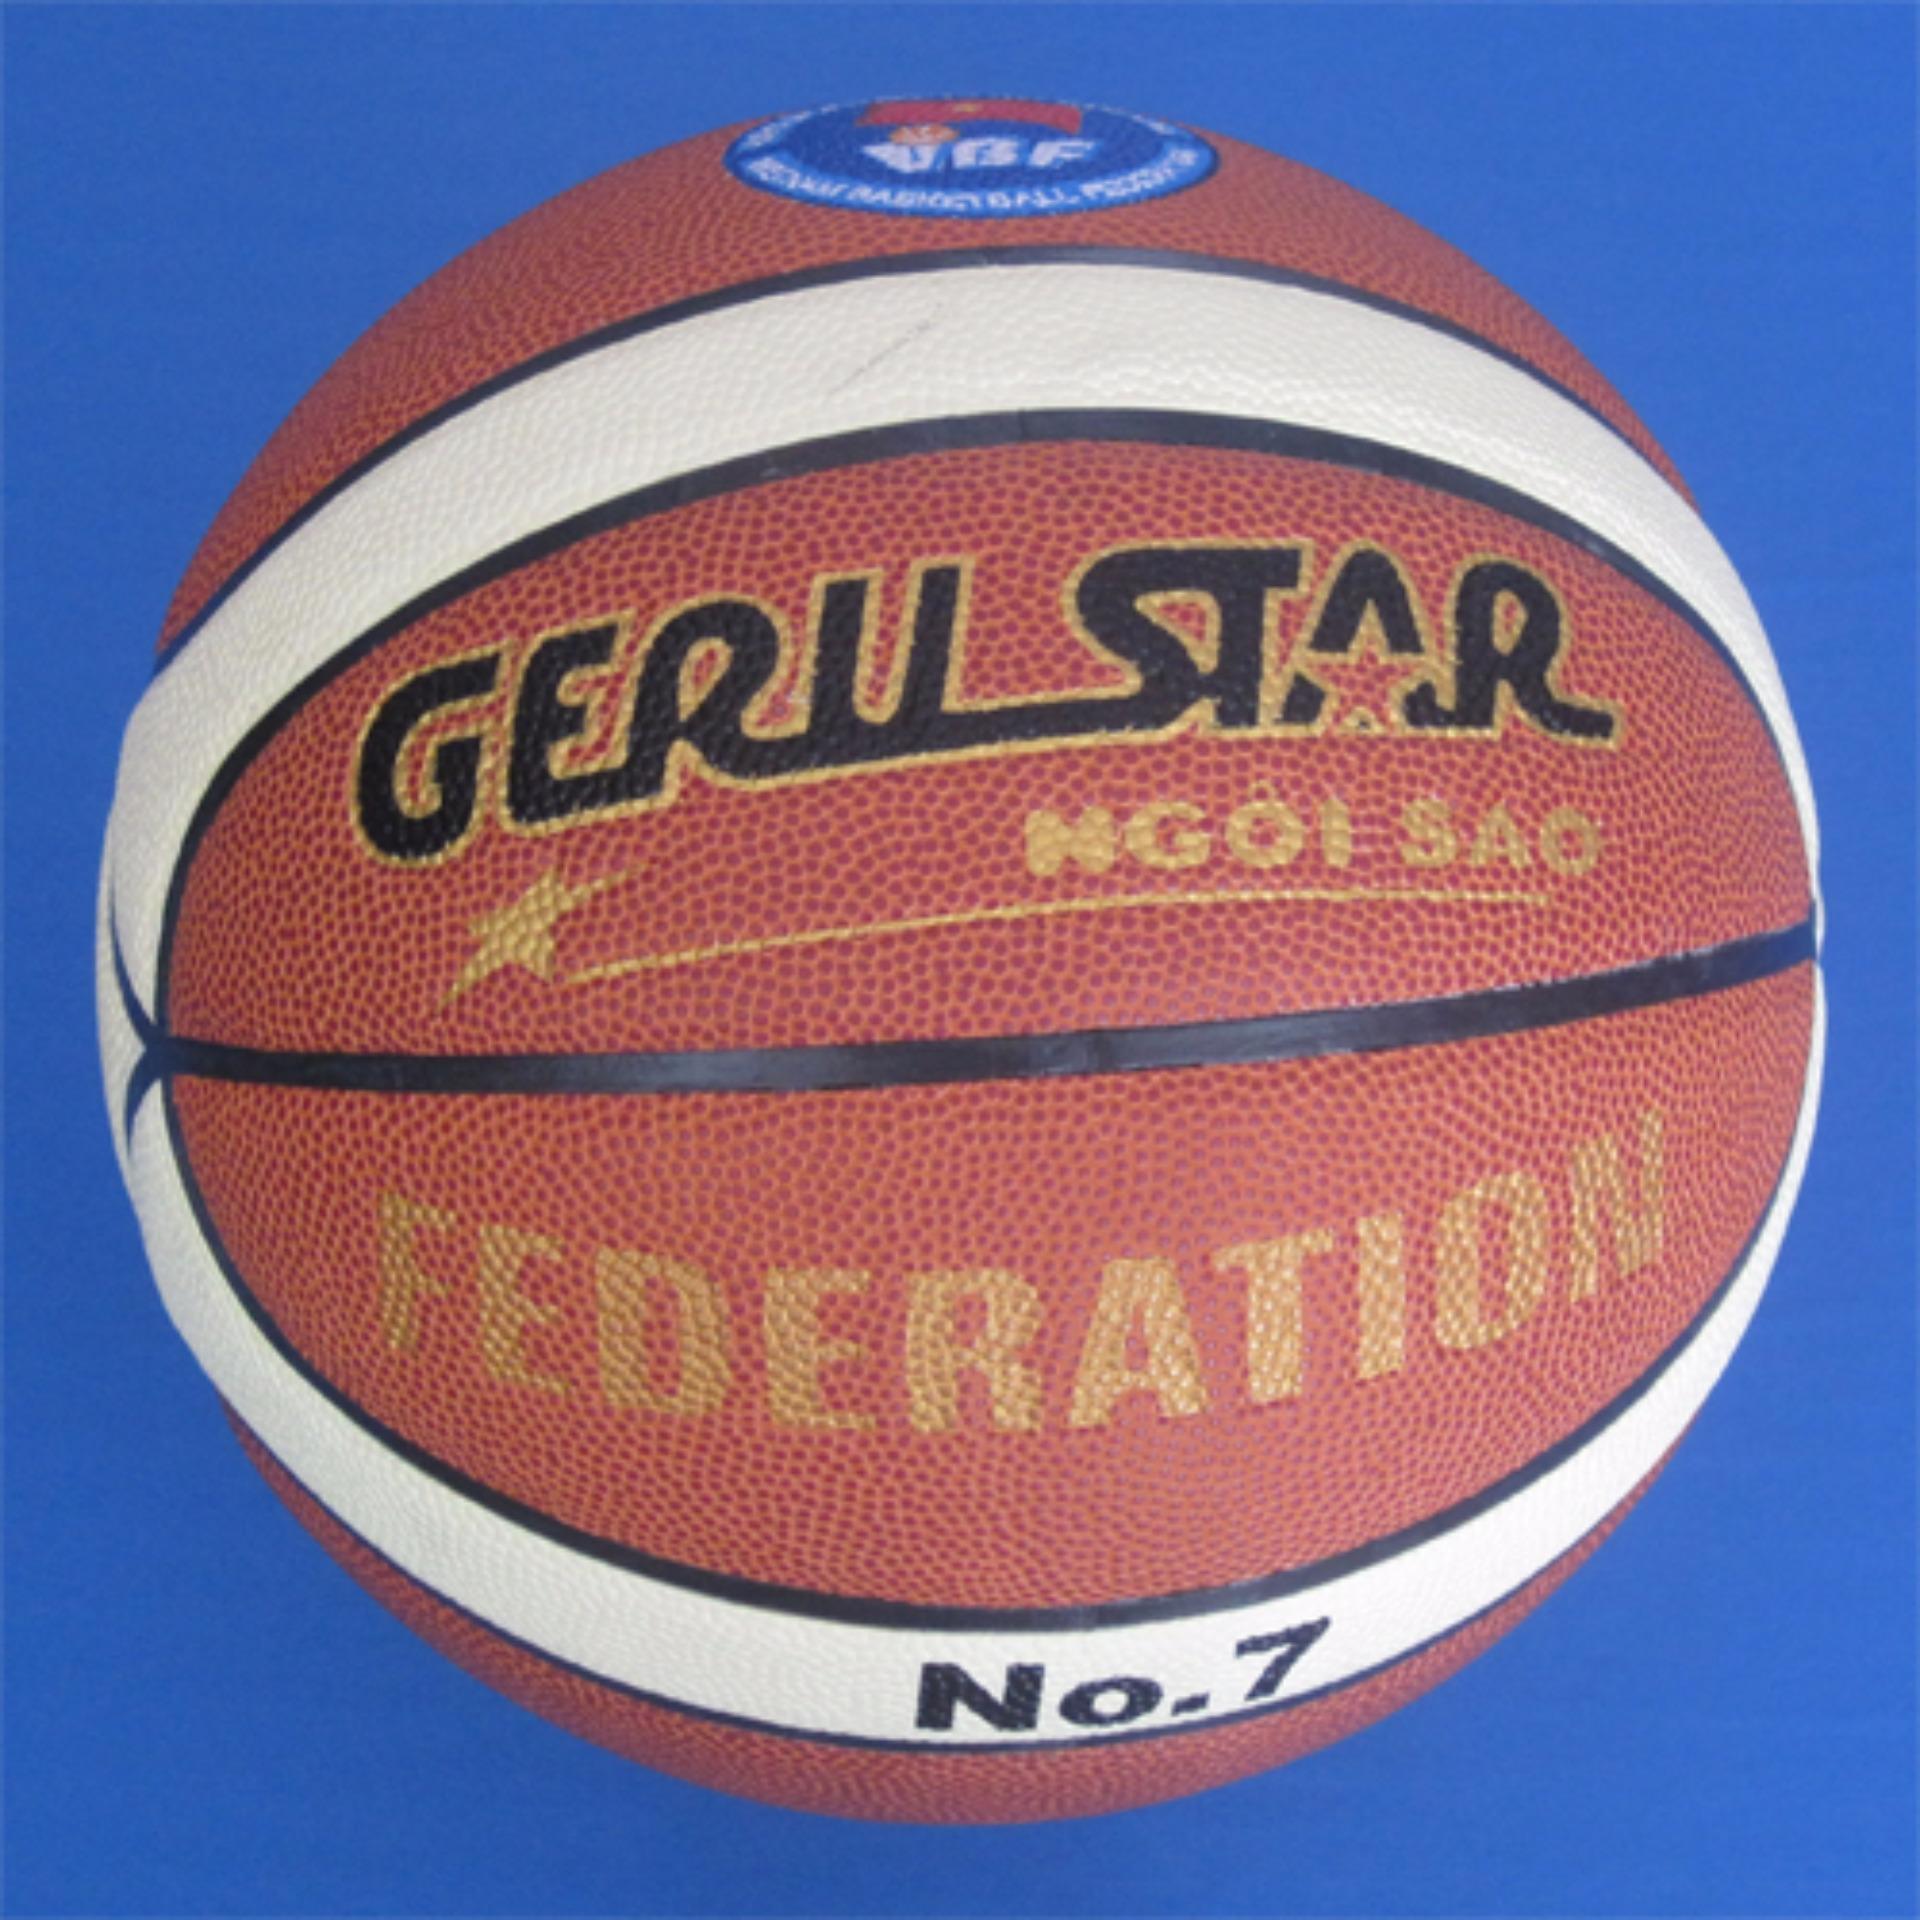 Bóng rổ da Federation số 7 Geru Sport